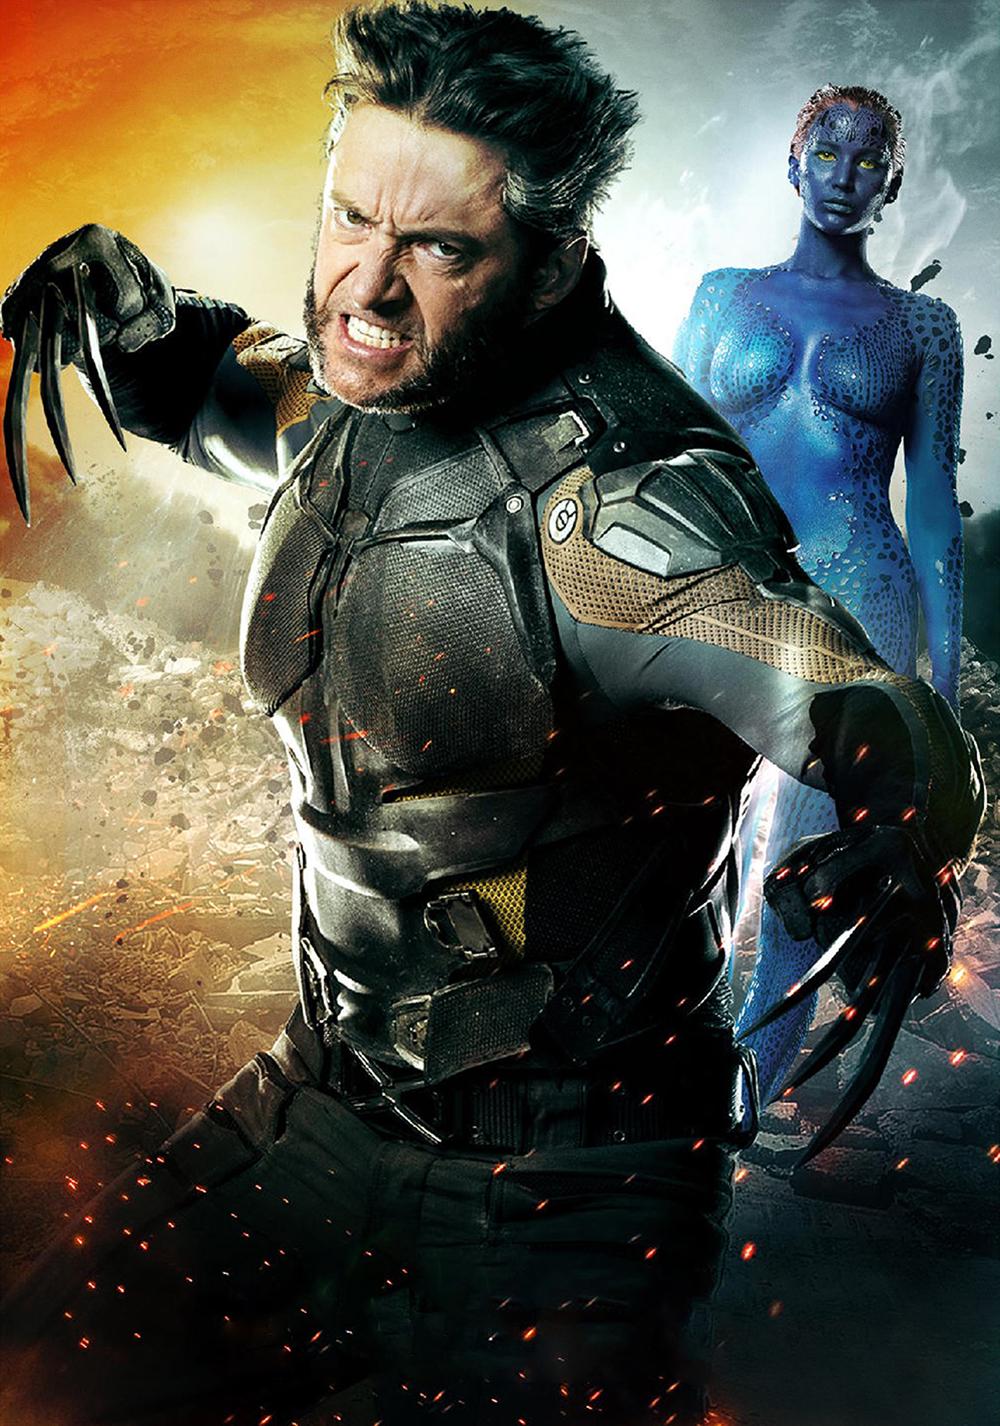 X-Men: Days of Future Past | Movie fanart | fanart.tv